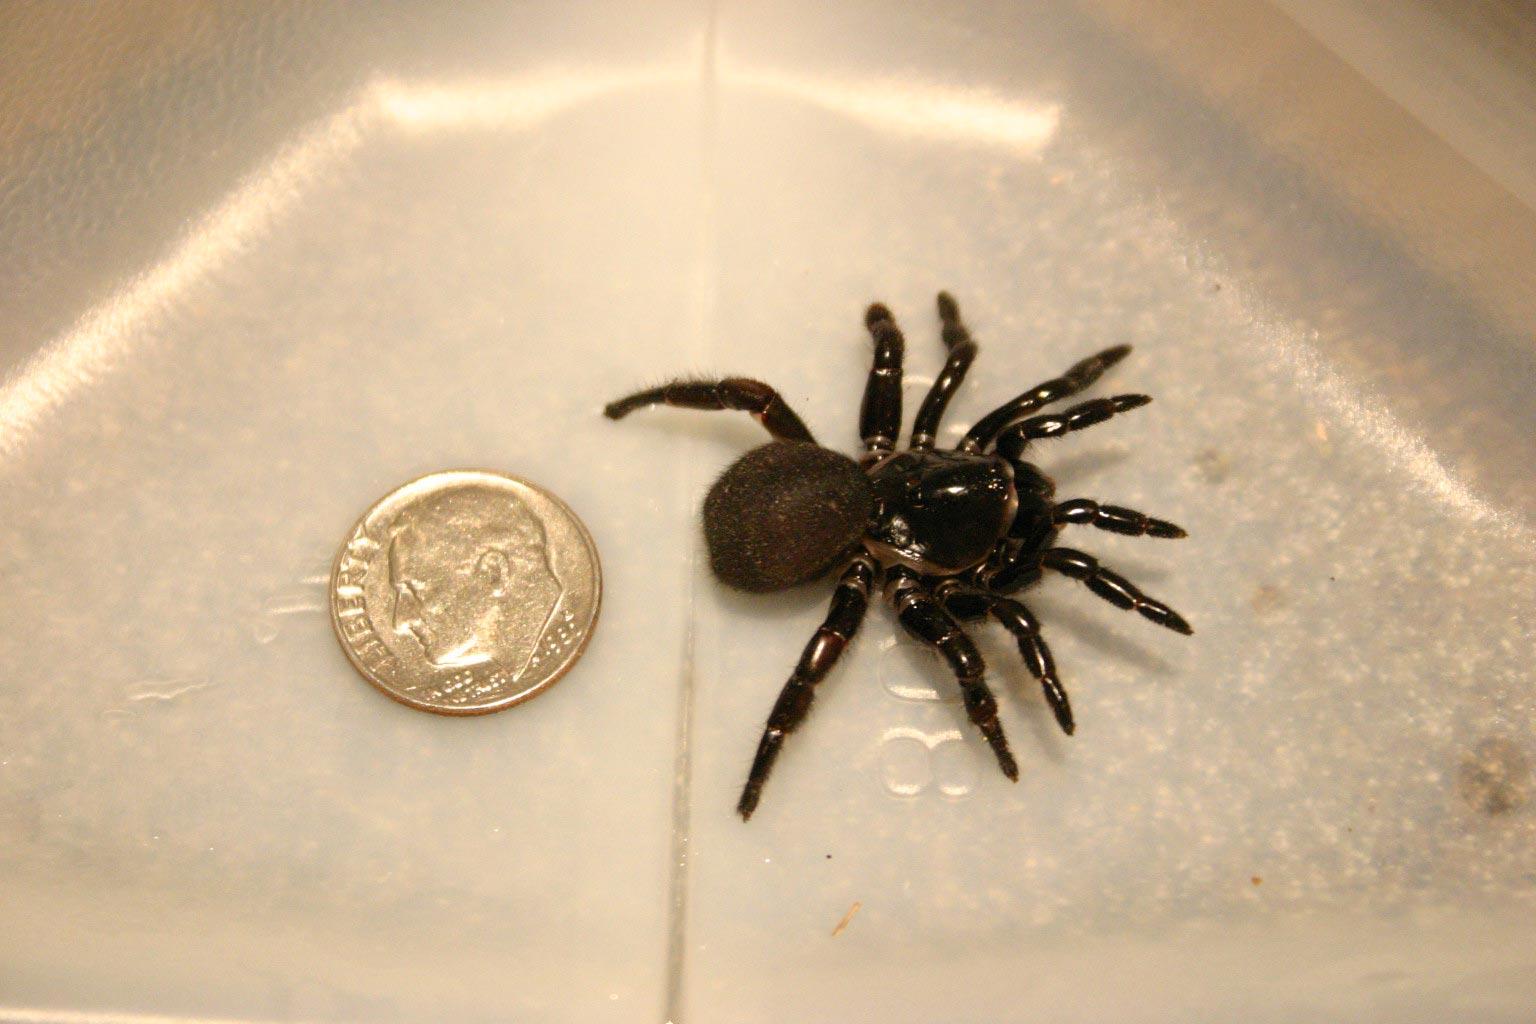 Spider Trap Door Ummidia 2 « Walter Reeves: The Georgia